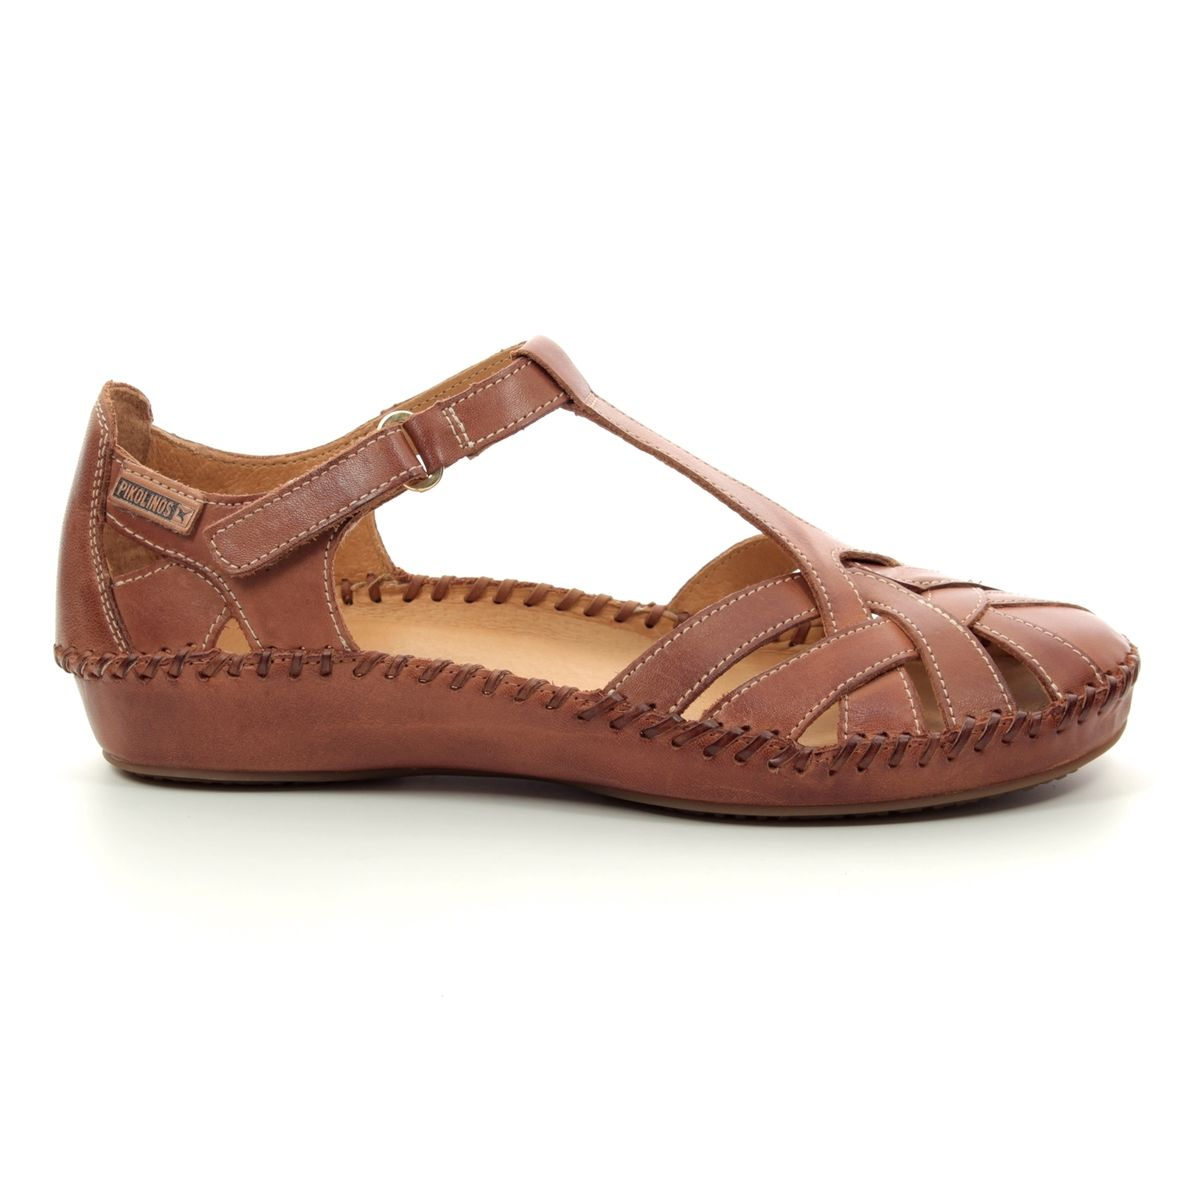 13cfb0ba955c7 Pikolinos Closed Toe Sandals - Tan Leather - 6550732/C1 VALLARTA WEAVE